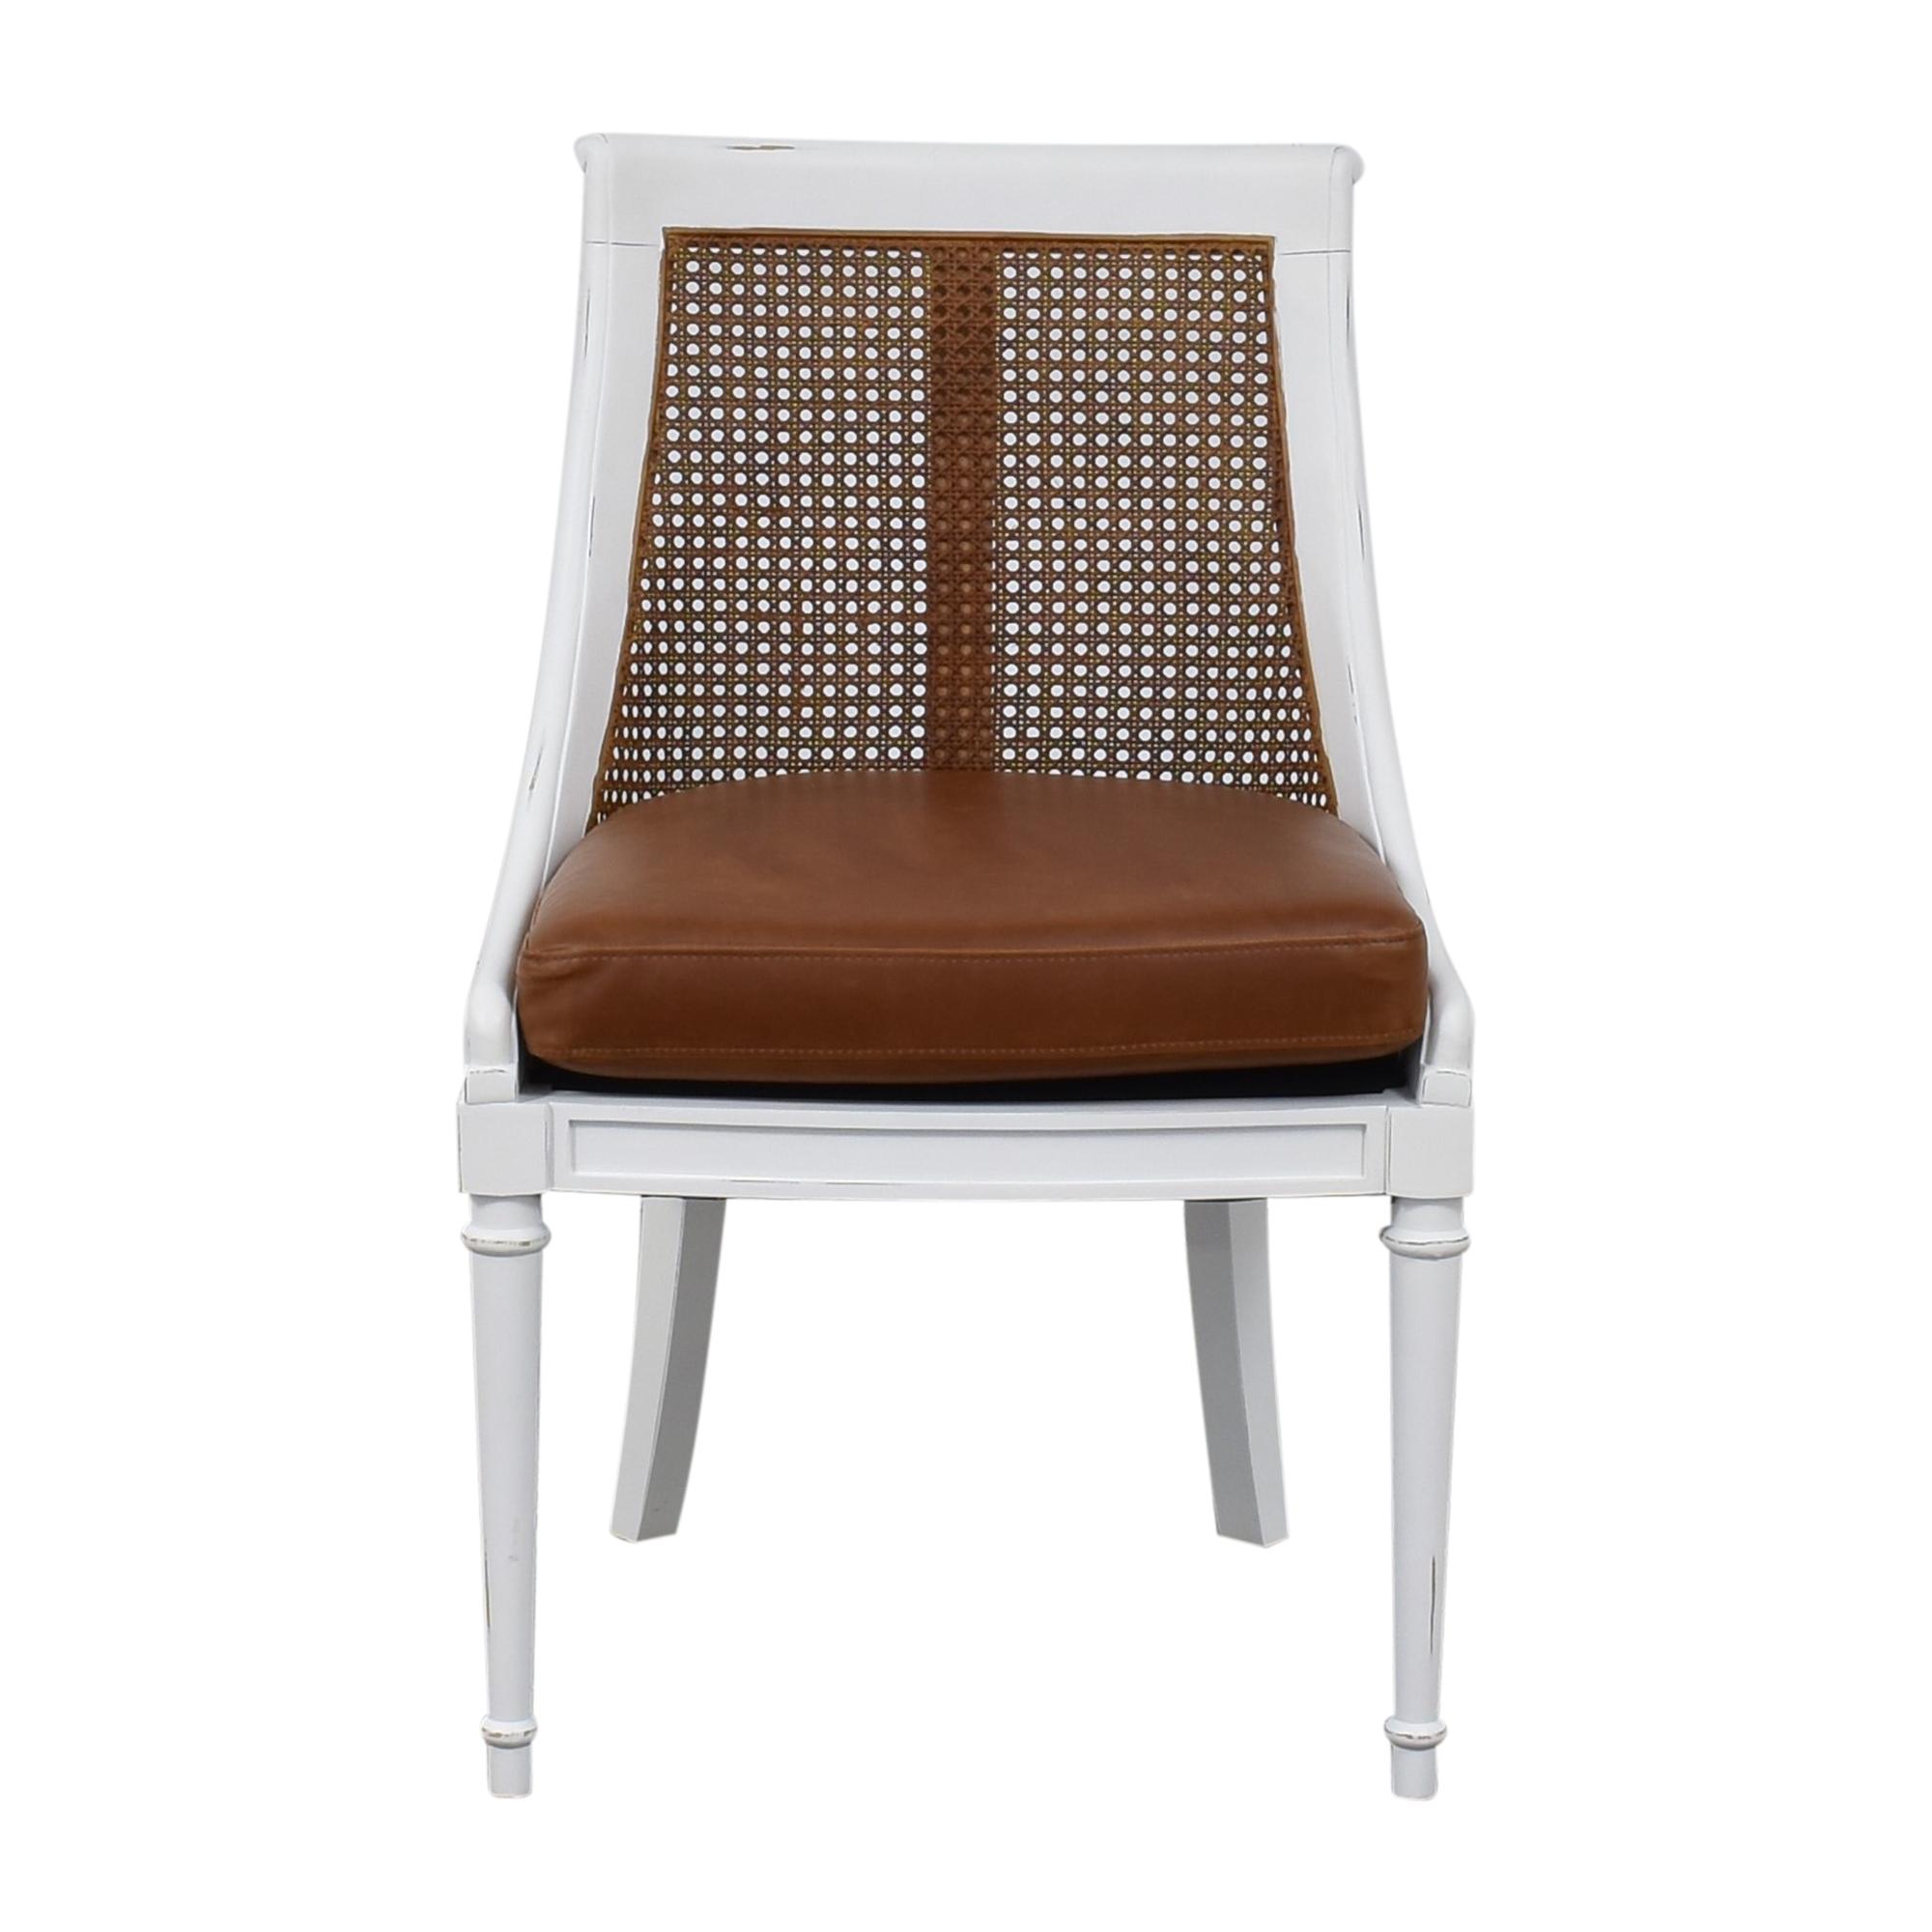 Safavieh Saylor Dining Chair / Chairs